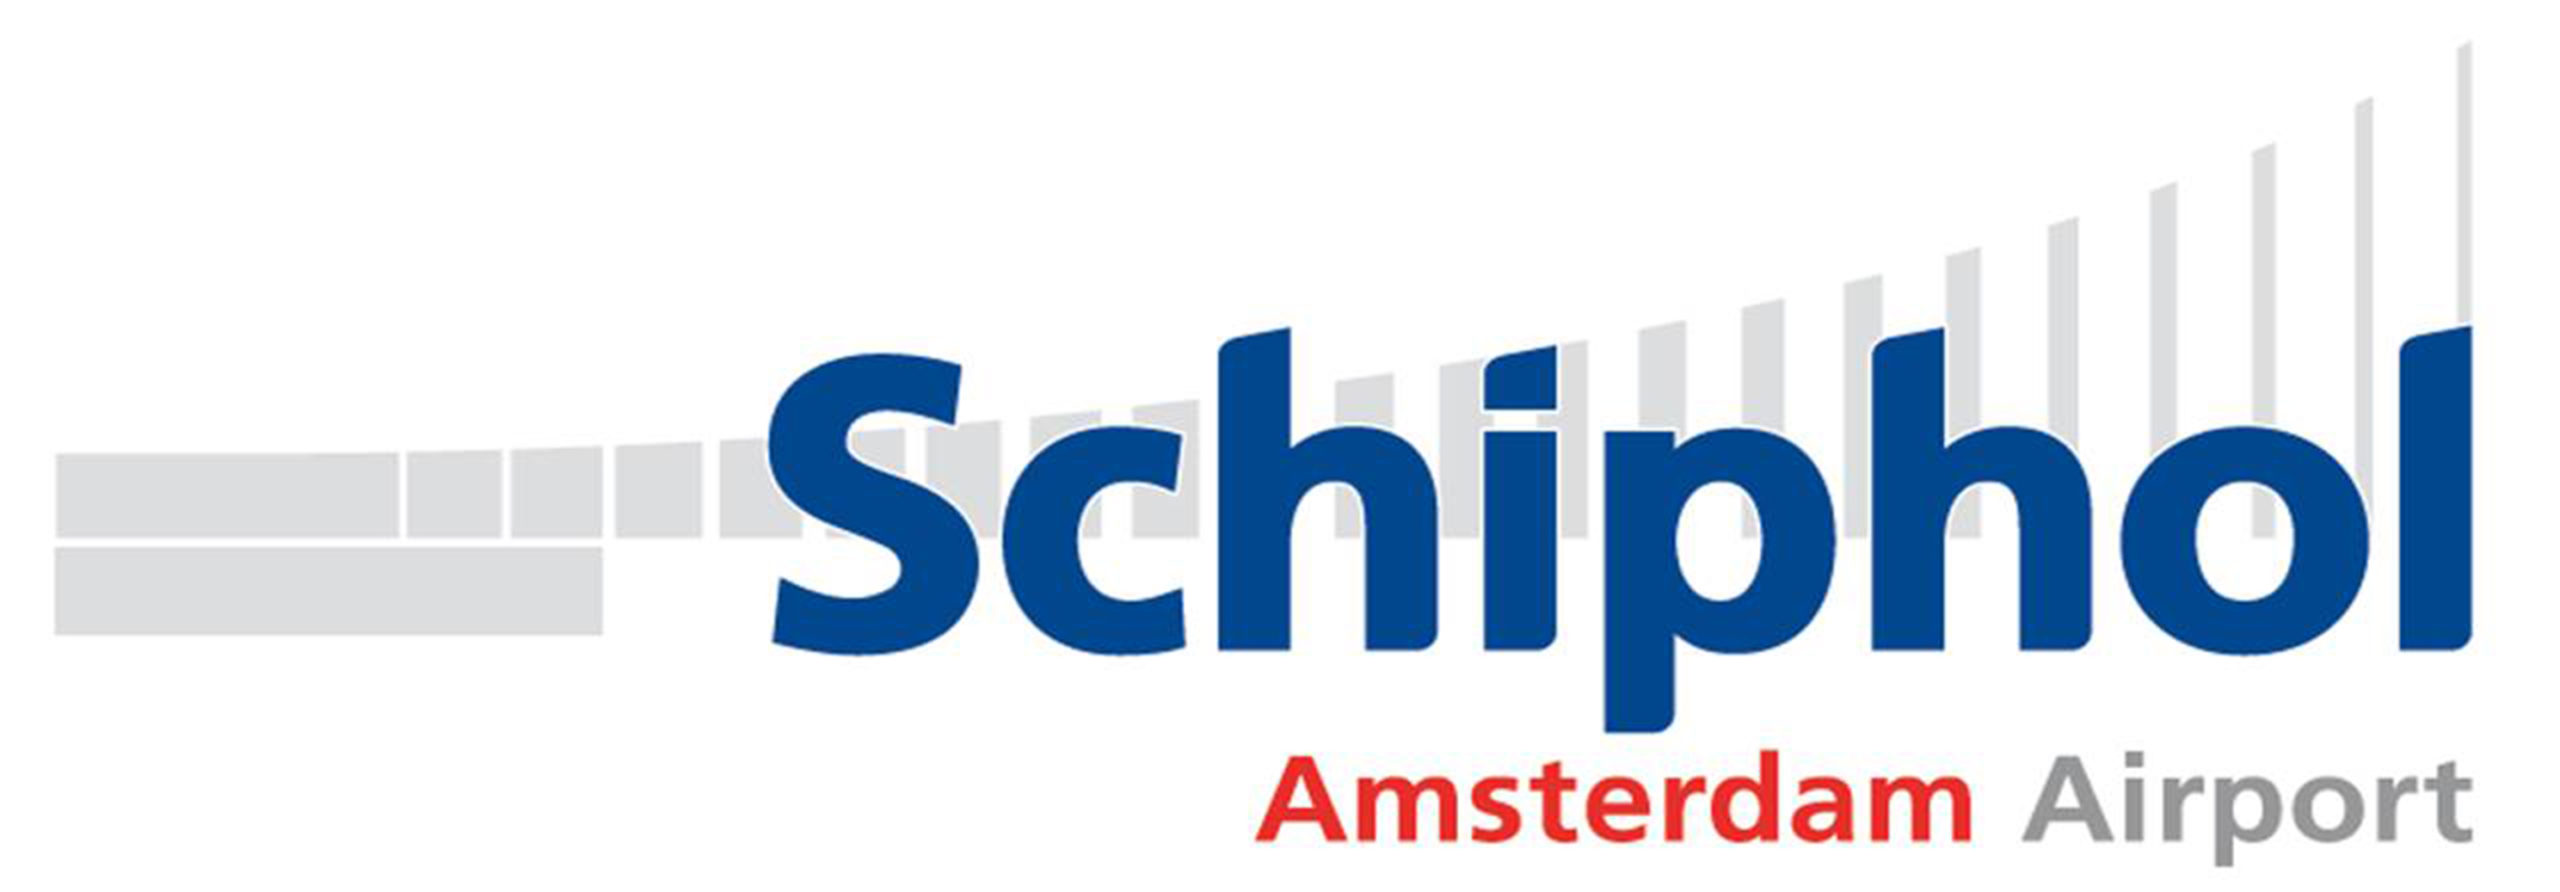 Schiphol Group logo